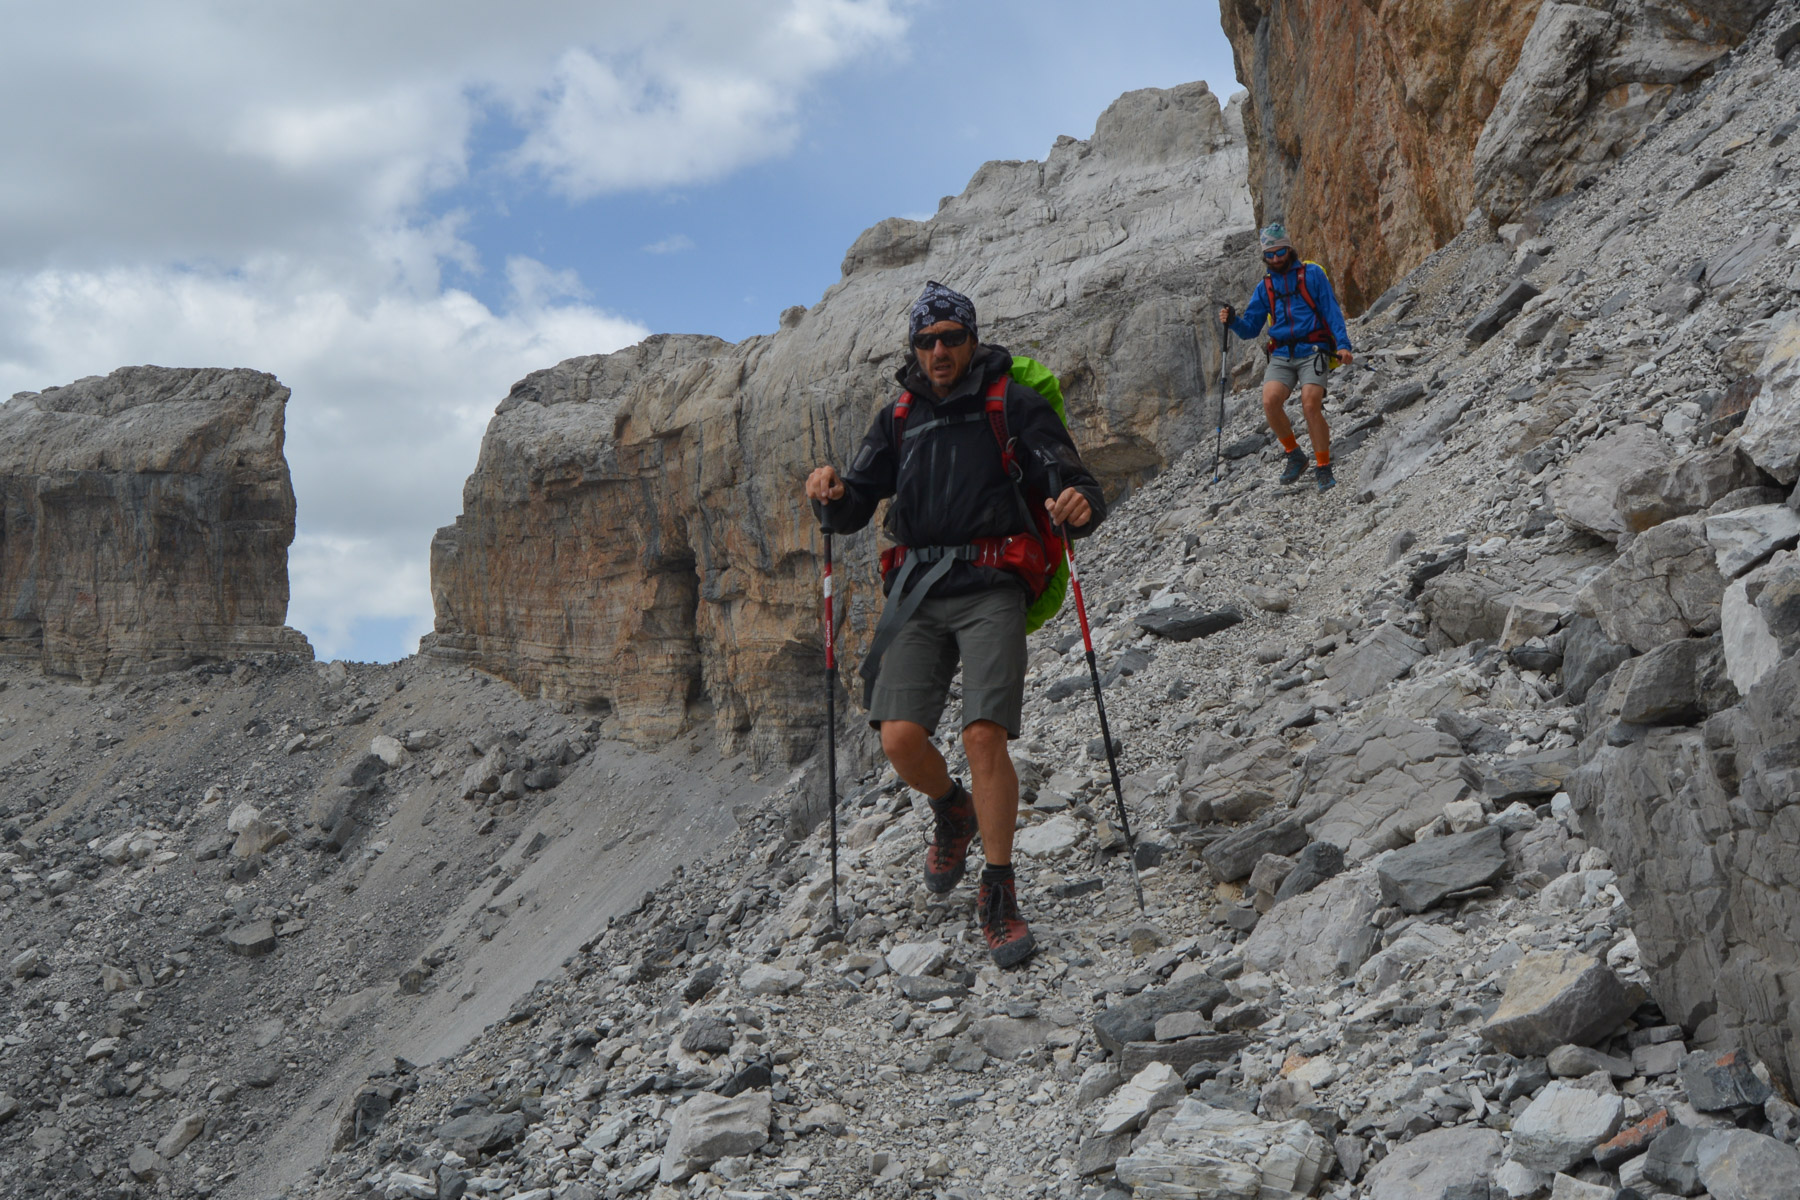 Monte Perdido et Faja de las Flores, Jour 1, Ordesa, Aragon, Espagne 25